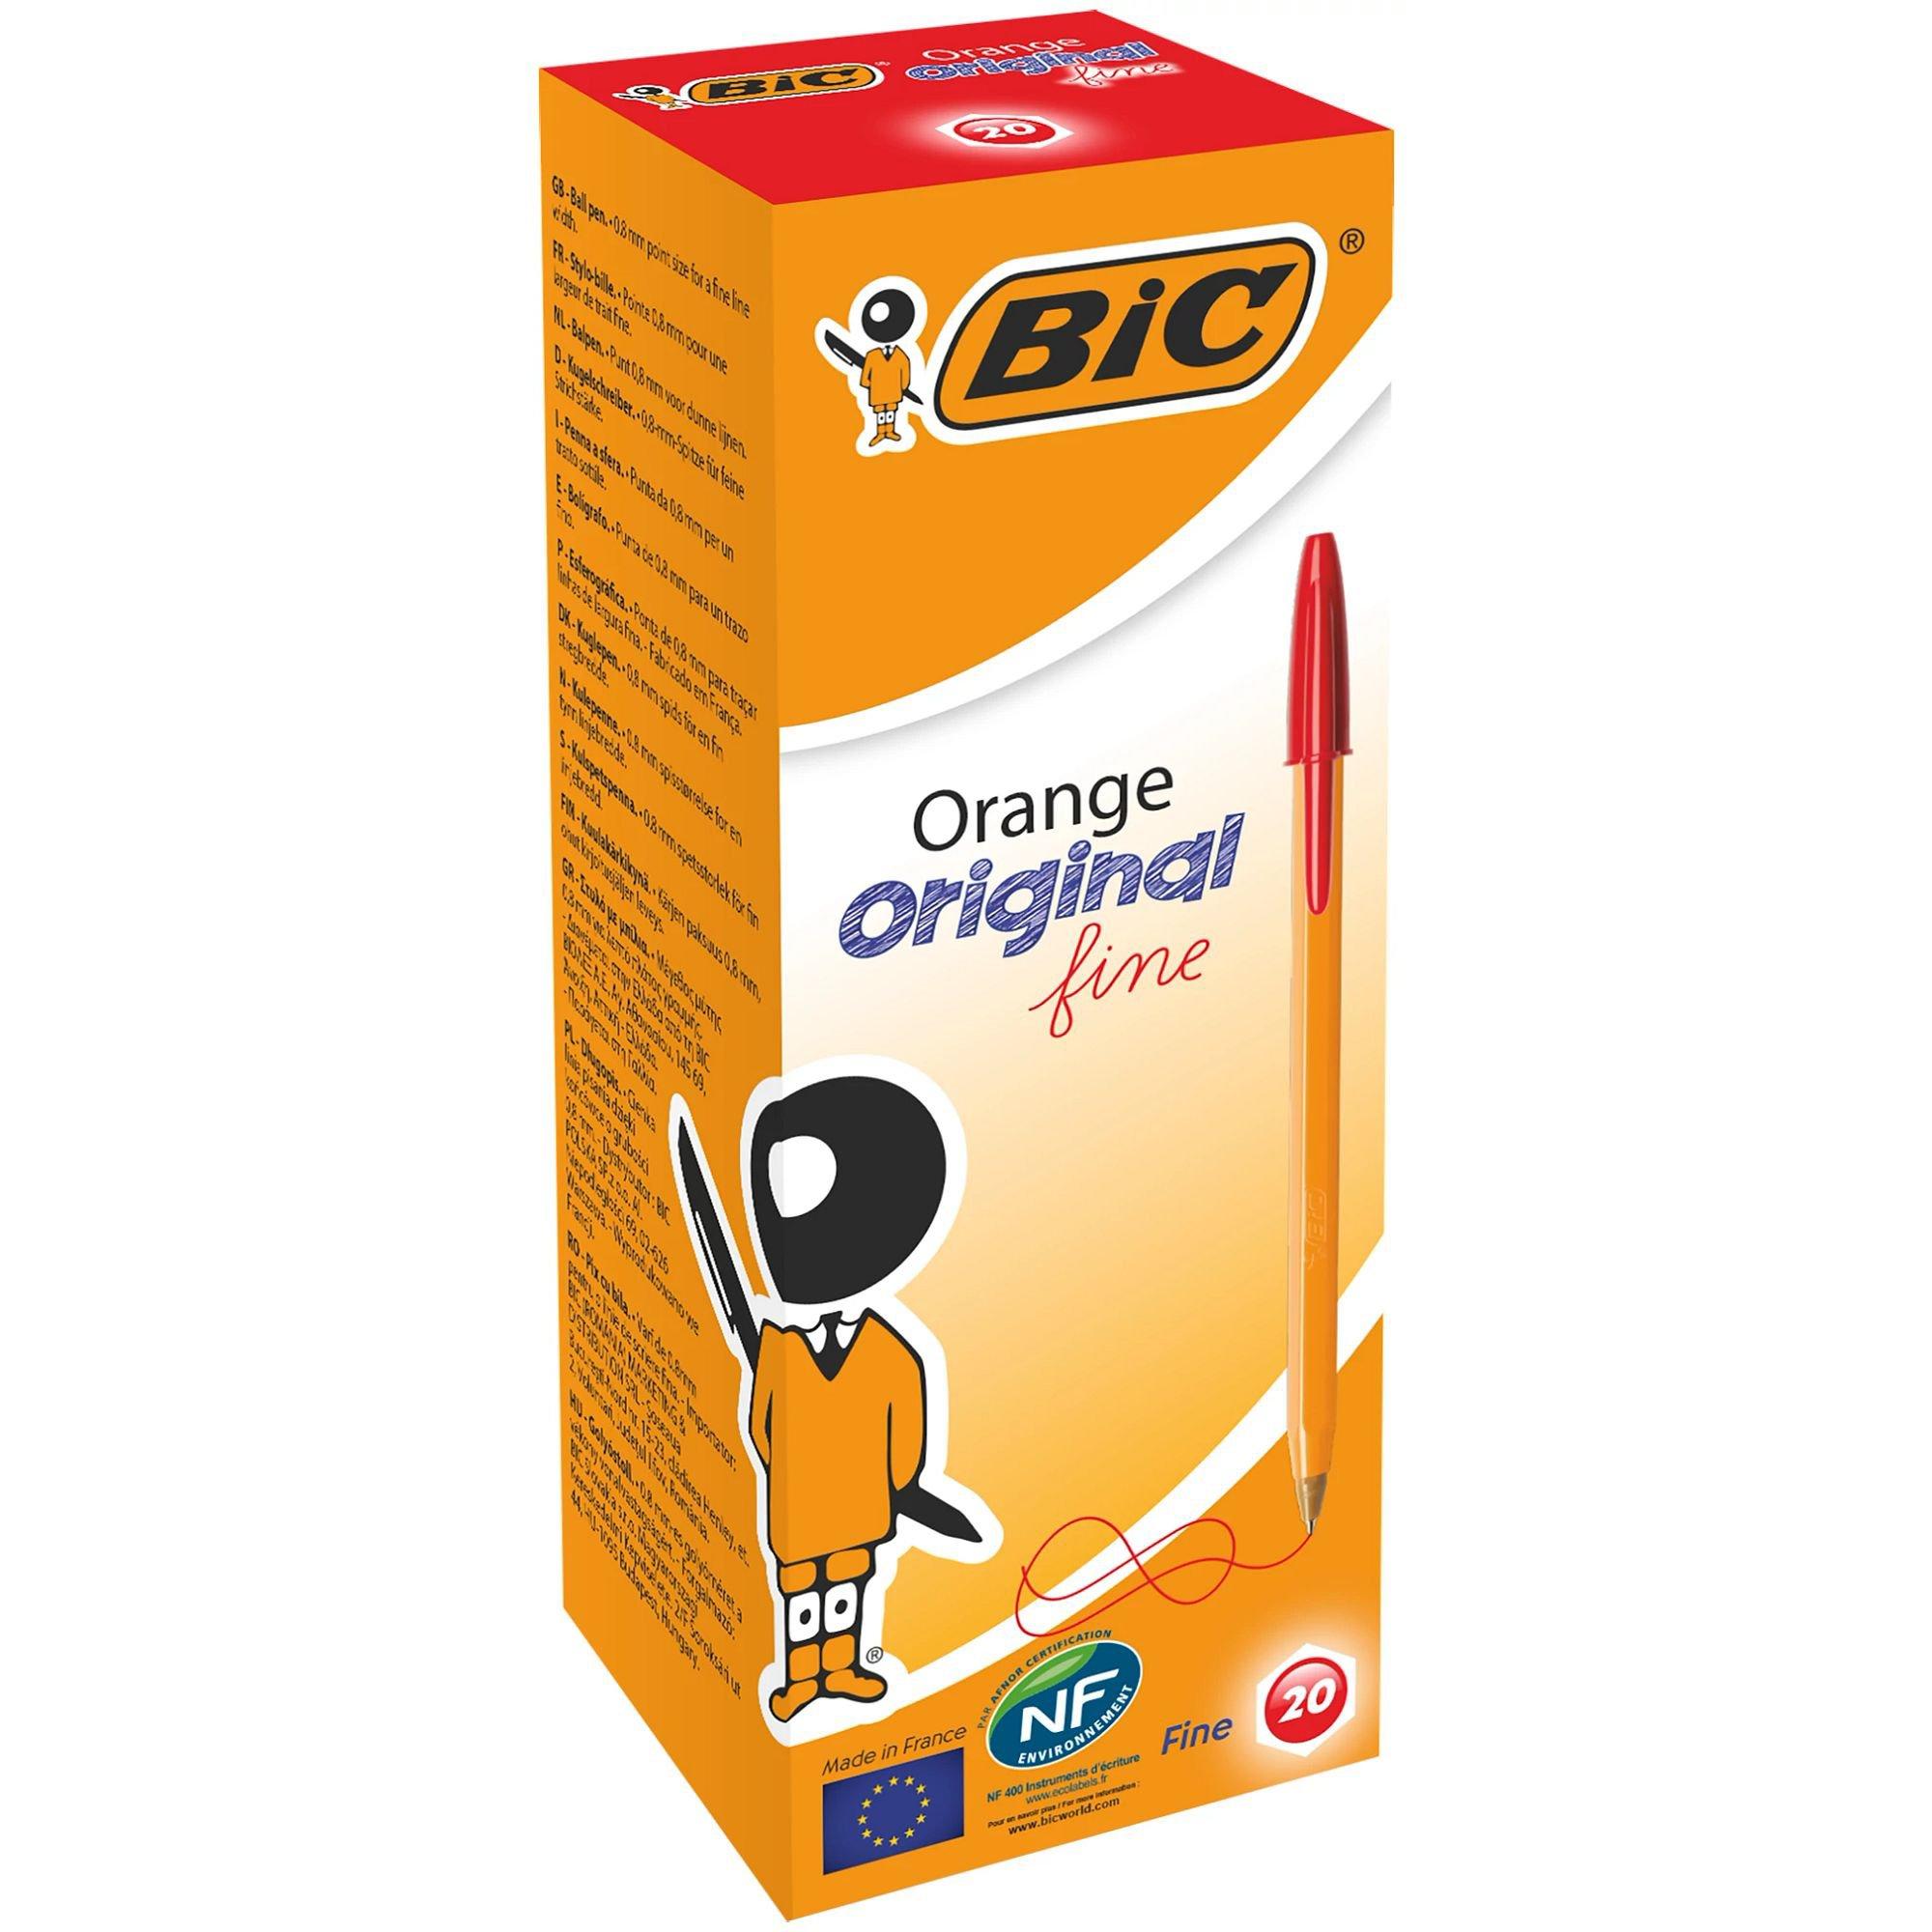 Image for BIC Orange Original Ballpoint Pen Fine Red 101120